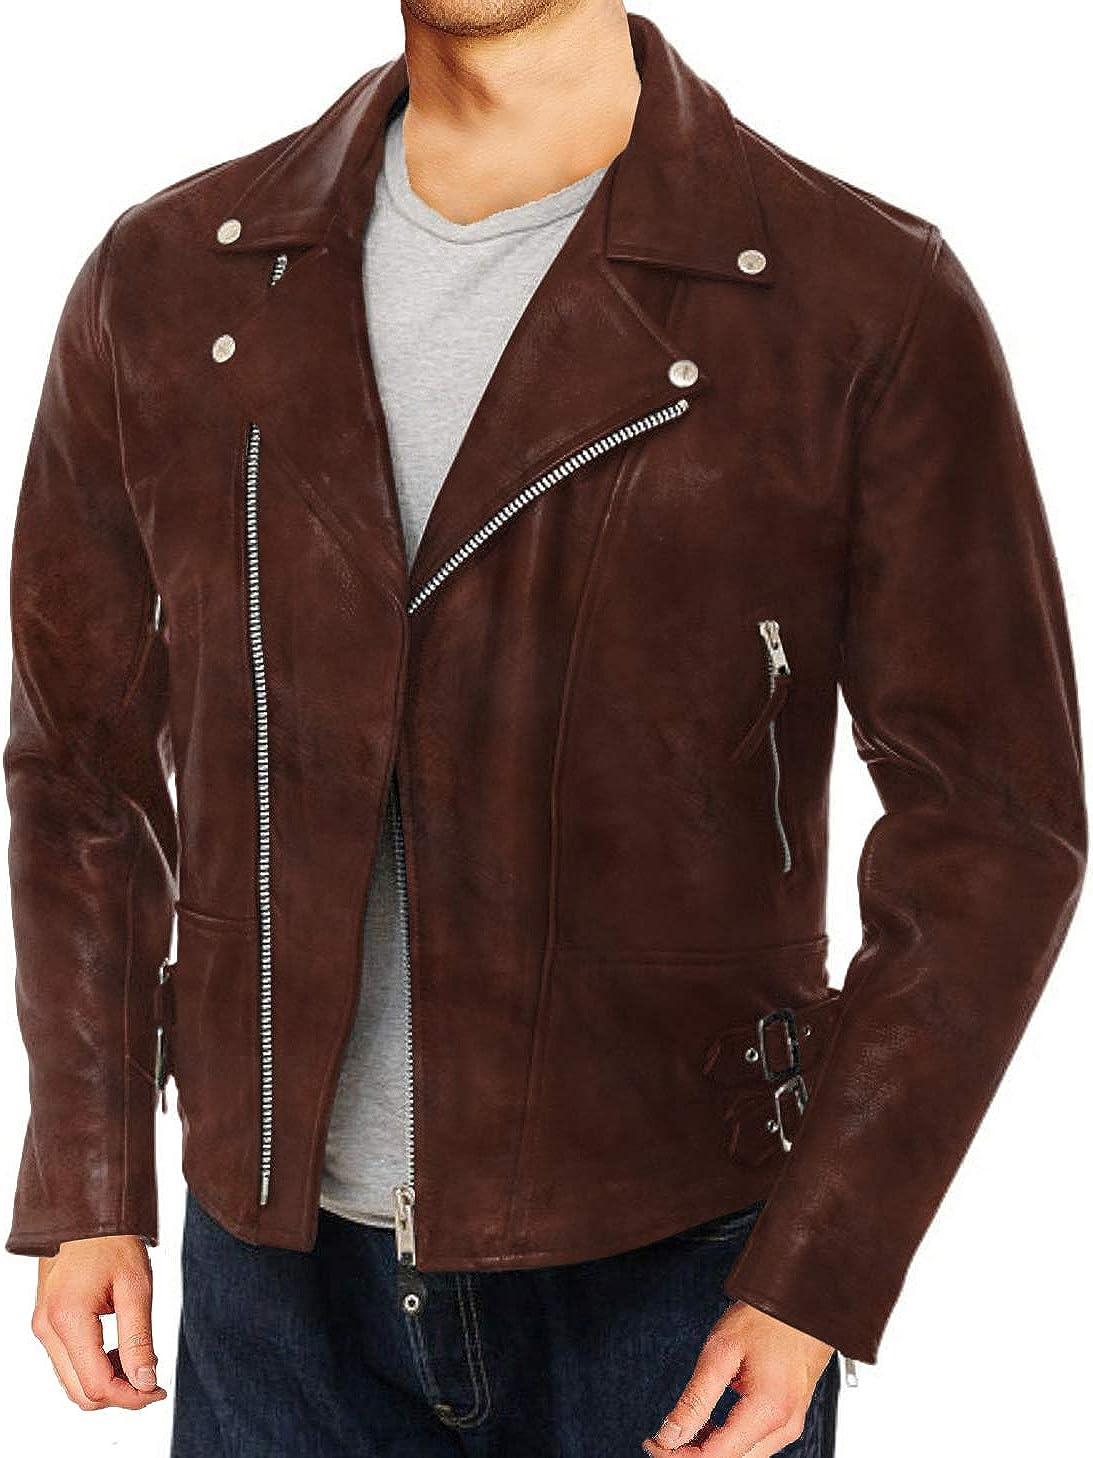 Laverapelle Mens Genuine Lambskin Leather Jacket 1501104 Black, Double Rider Jacket